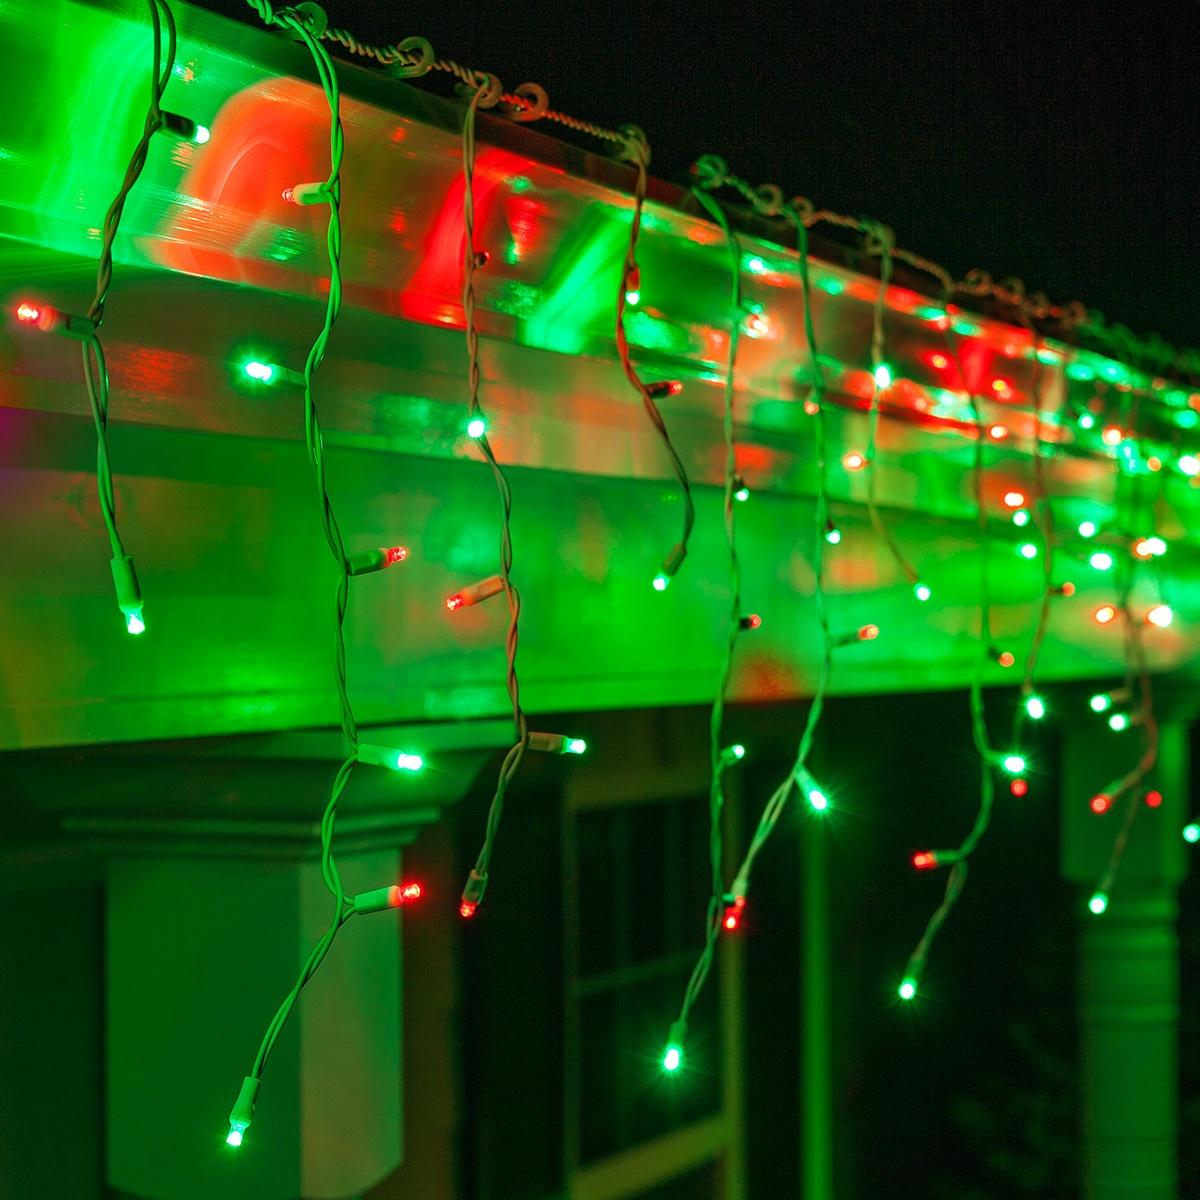 LED Christmas Lights - 70 5mm Red, Green LED Icicle Lights